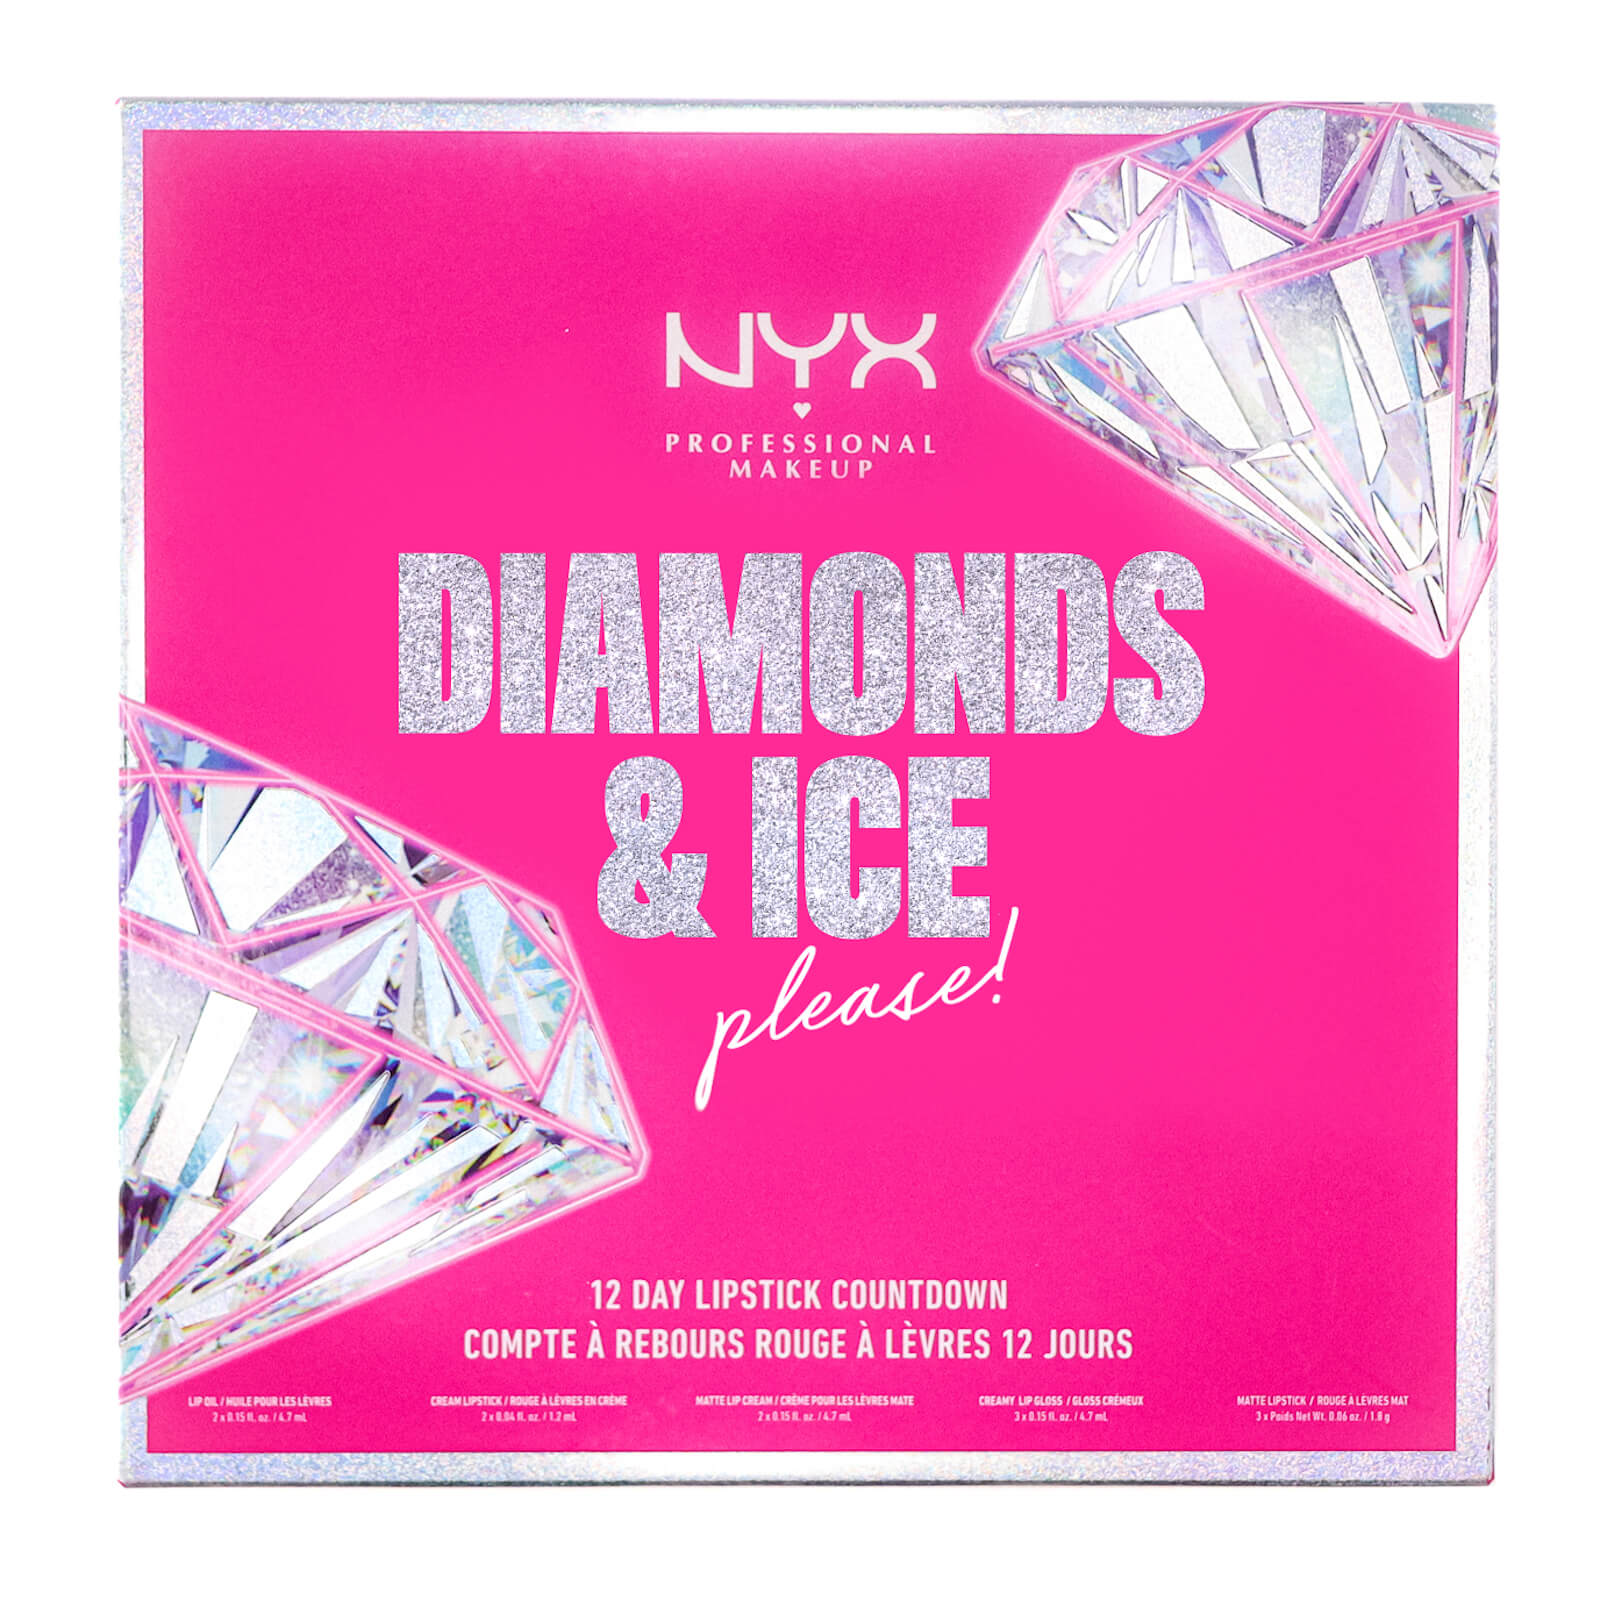 NYX Professional Makeup Diamonds and Ice Please 12 Day Lipstick